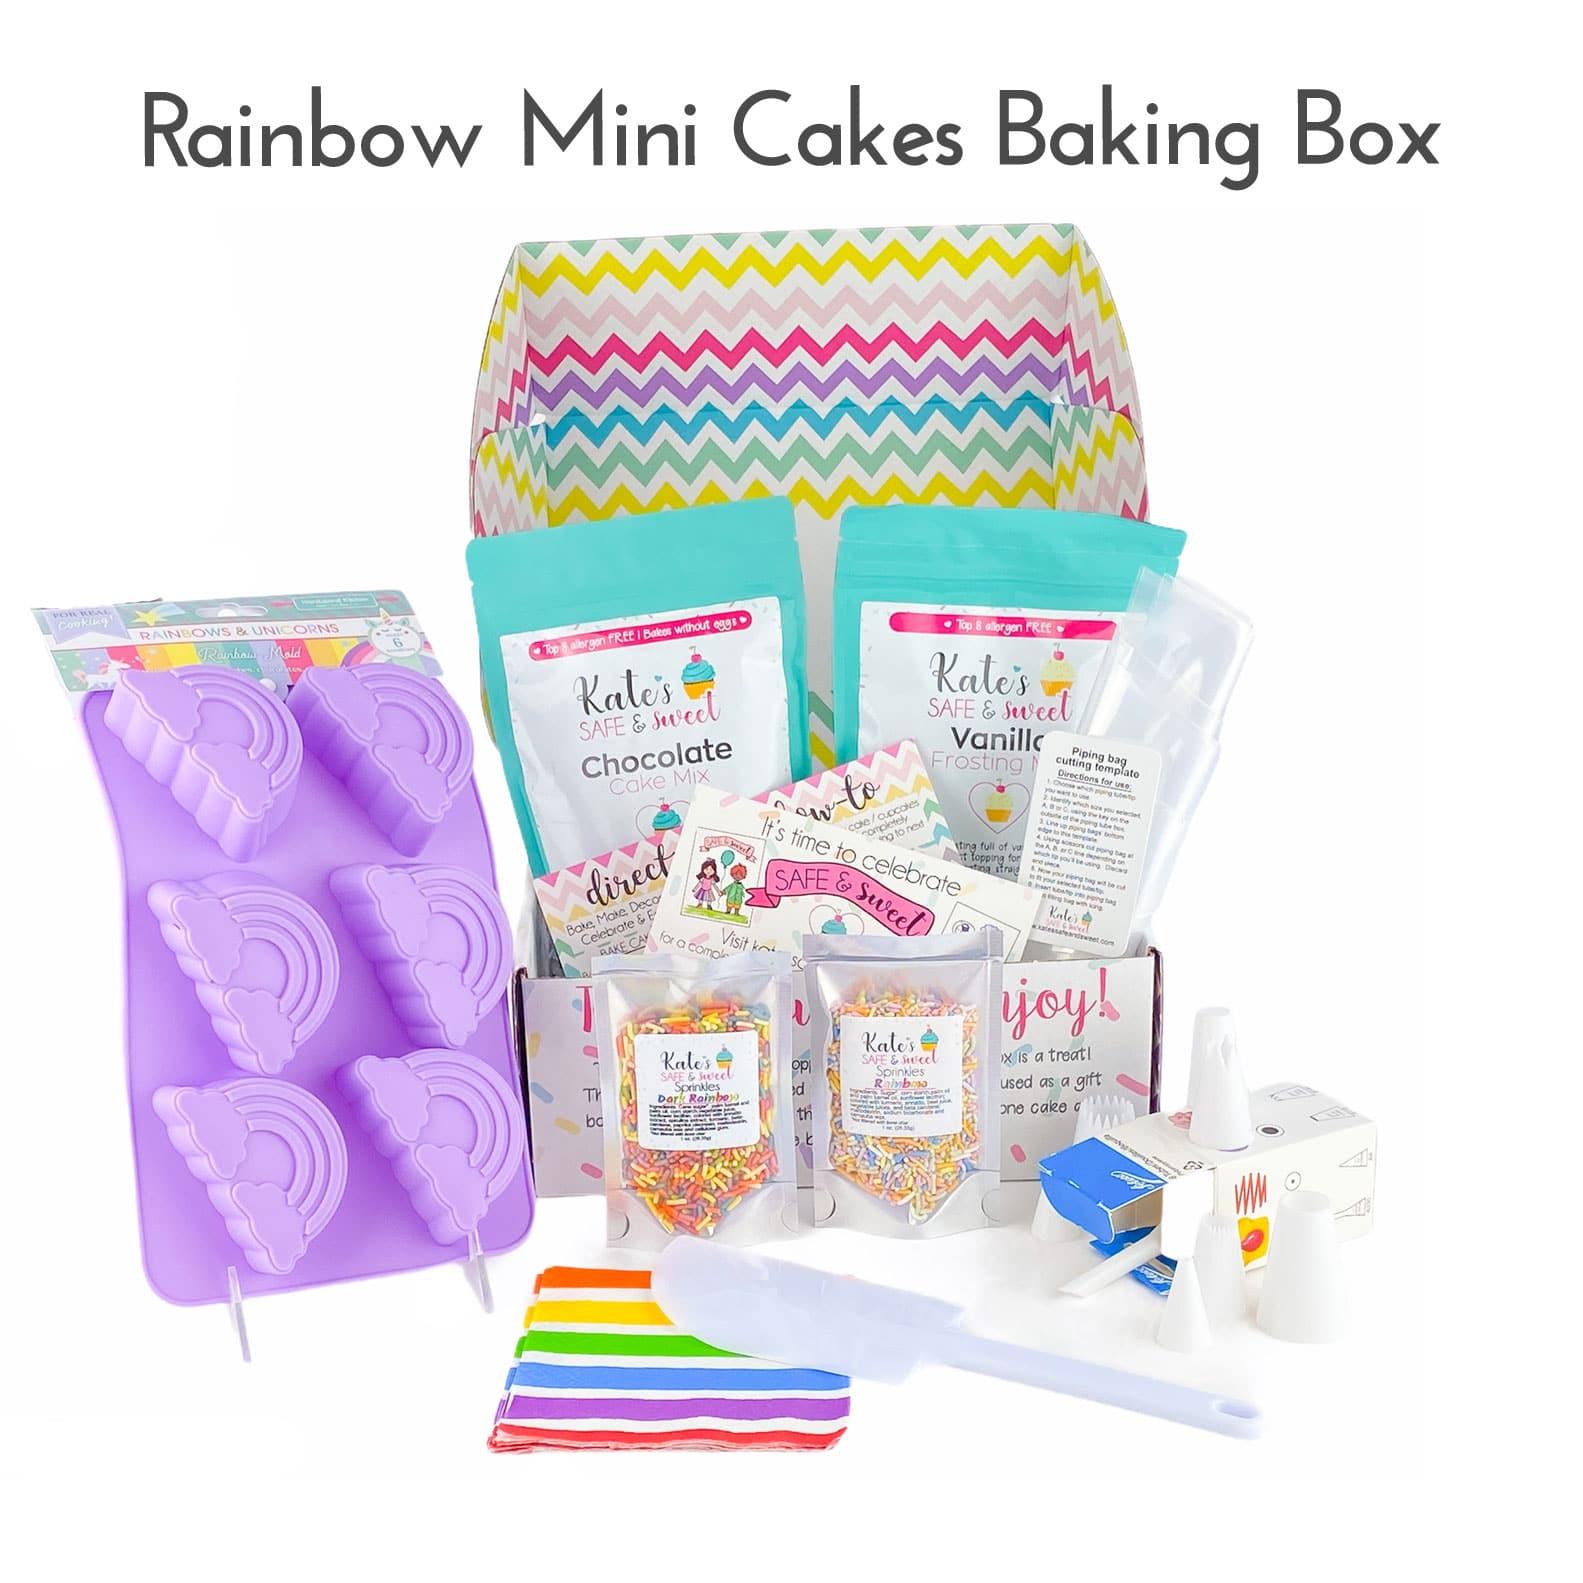 Kate's-Safe-&-Sweet---Rainbow-Mini-Cakes-Baking-Box